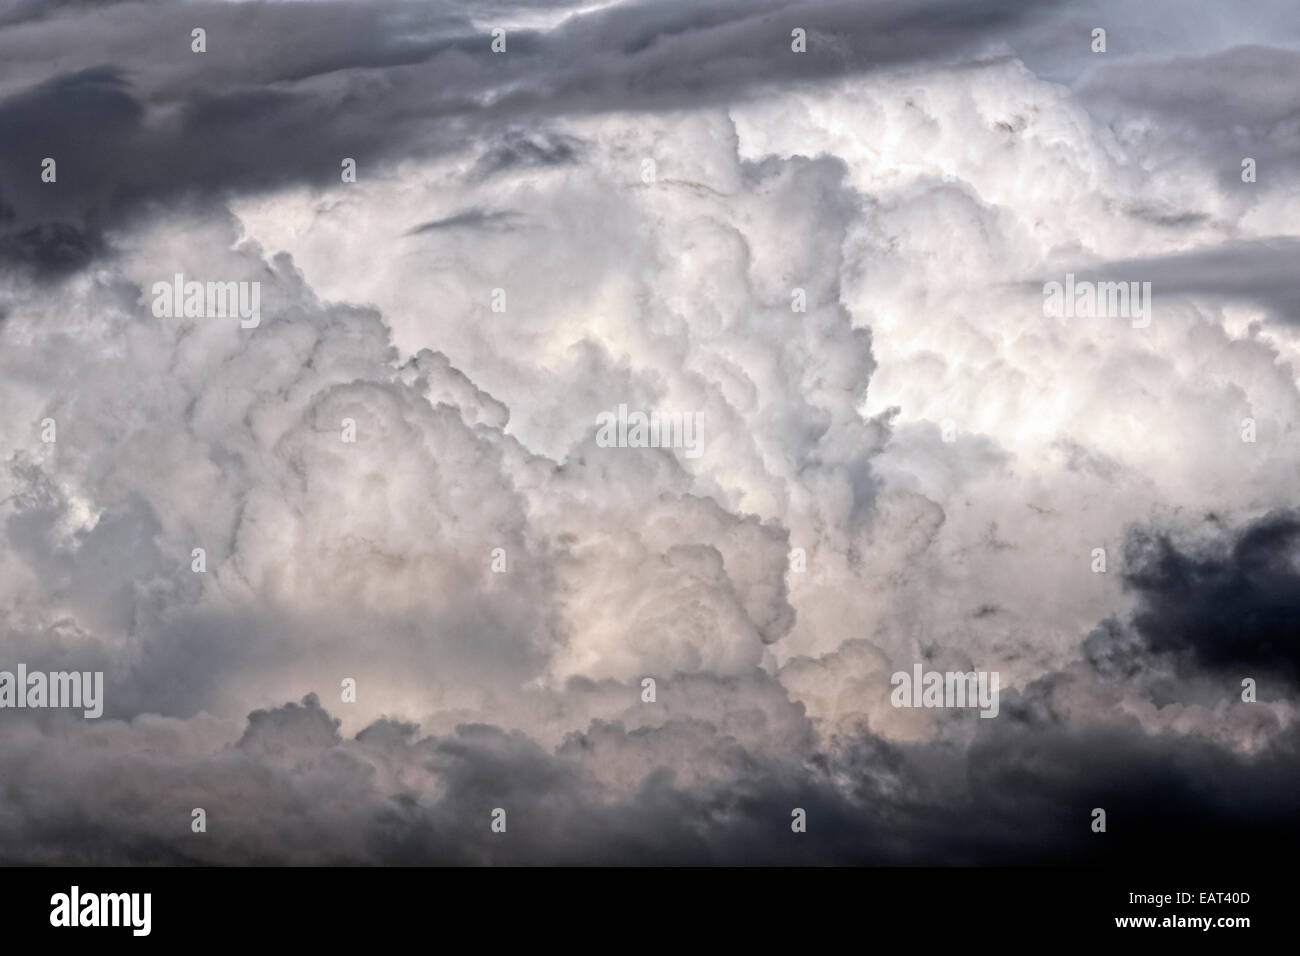 Cumulonimbus Cloud Structure - Stock Image